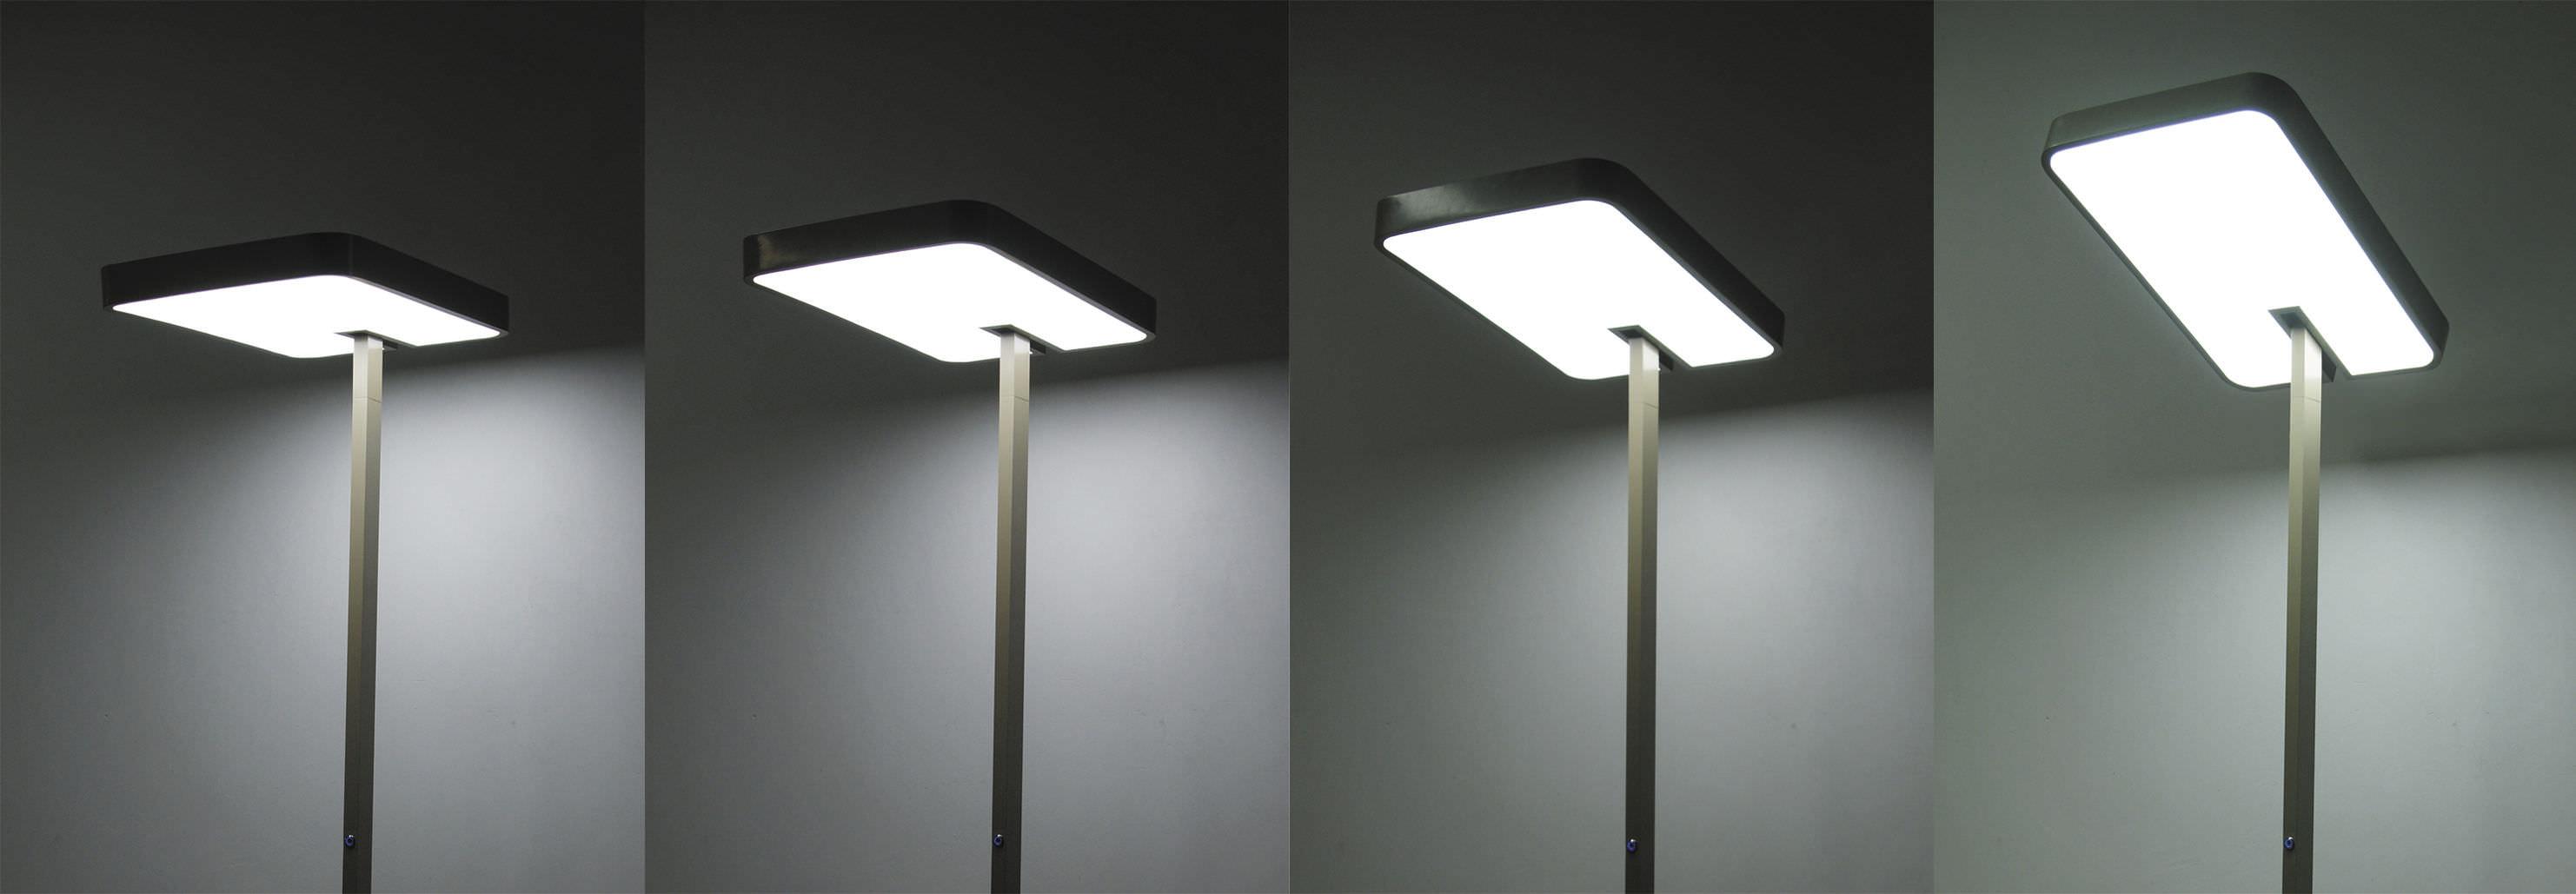 87616 5677949 5 Incroyable Lampe Led Sur Pied Ojr7